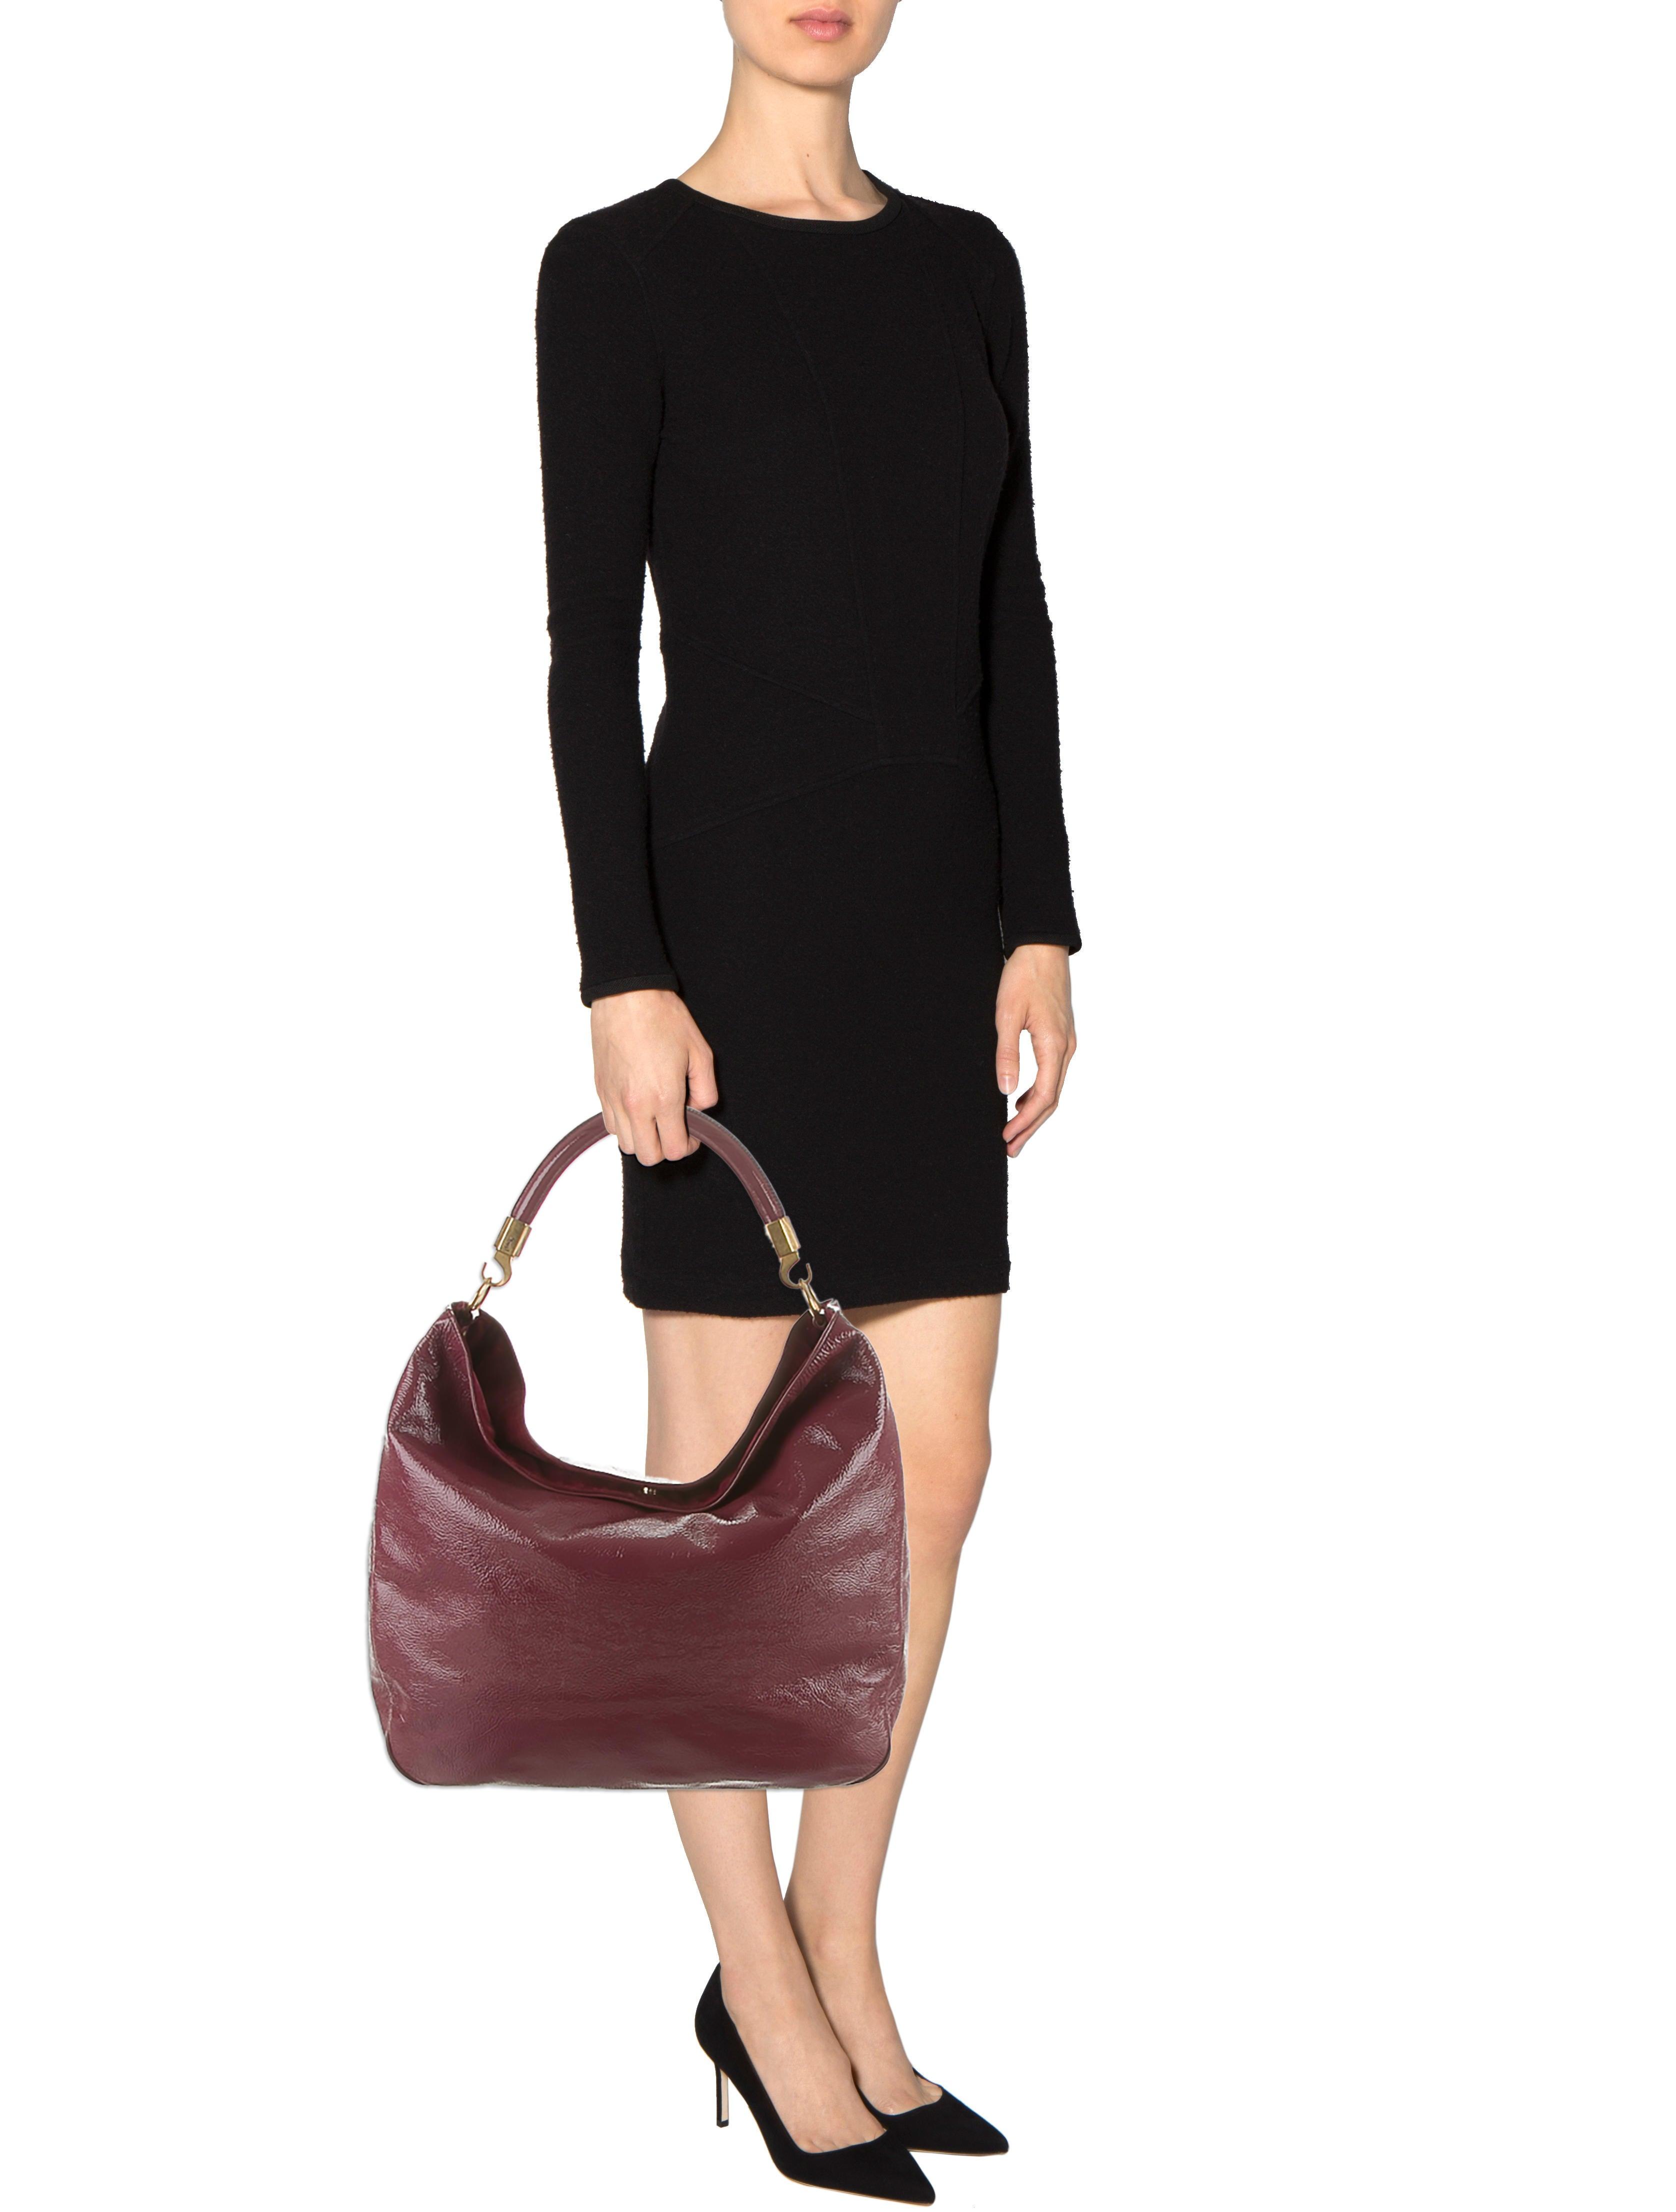 Yves Saint Laurent Patent Leather Roady Bag - Handbags - YVE38430 ...